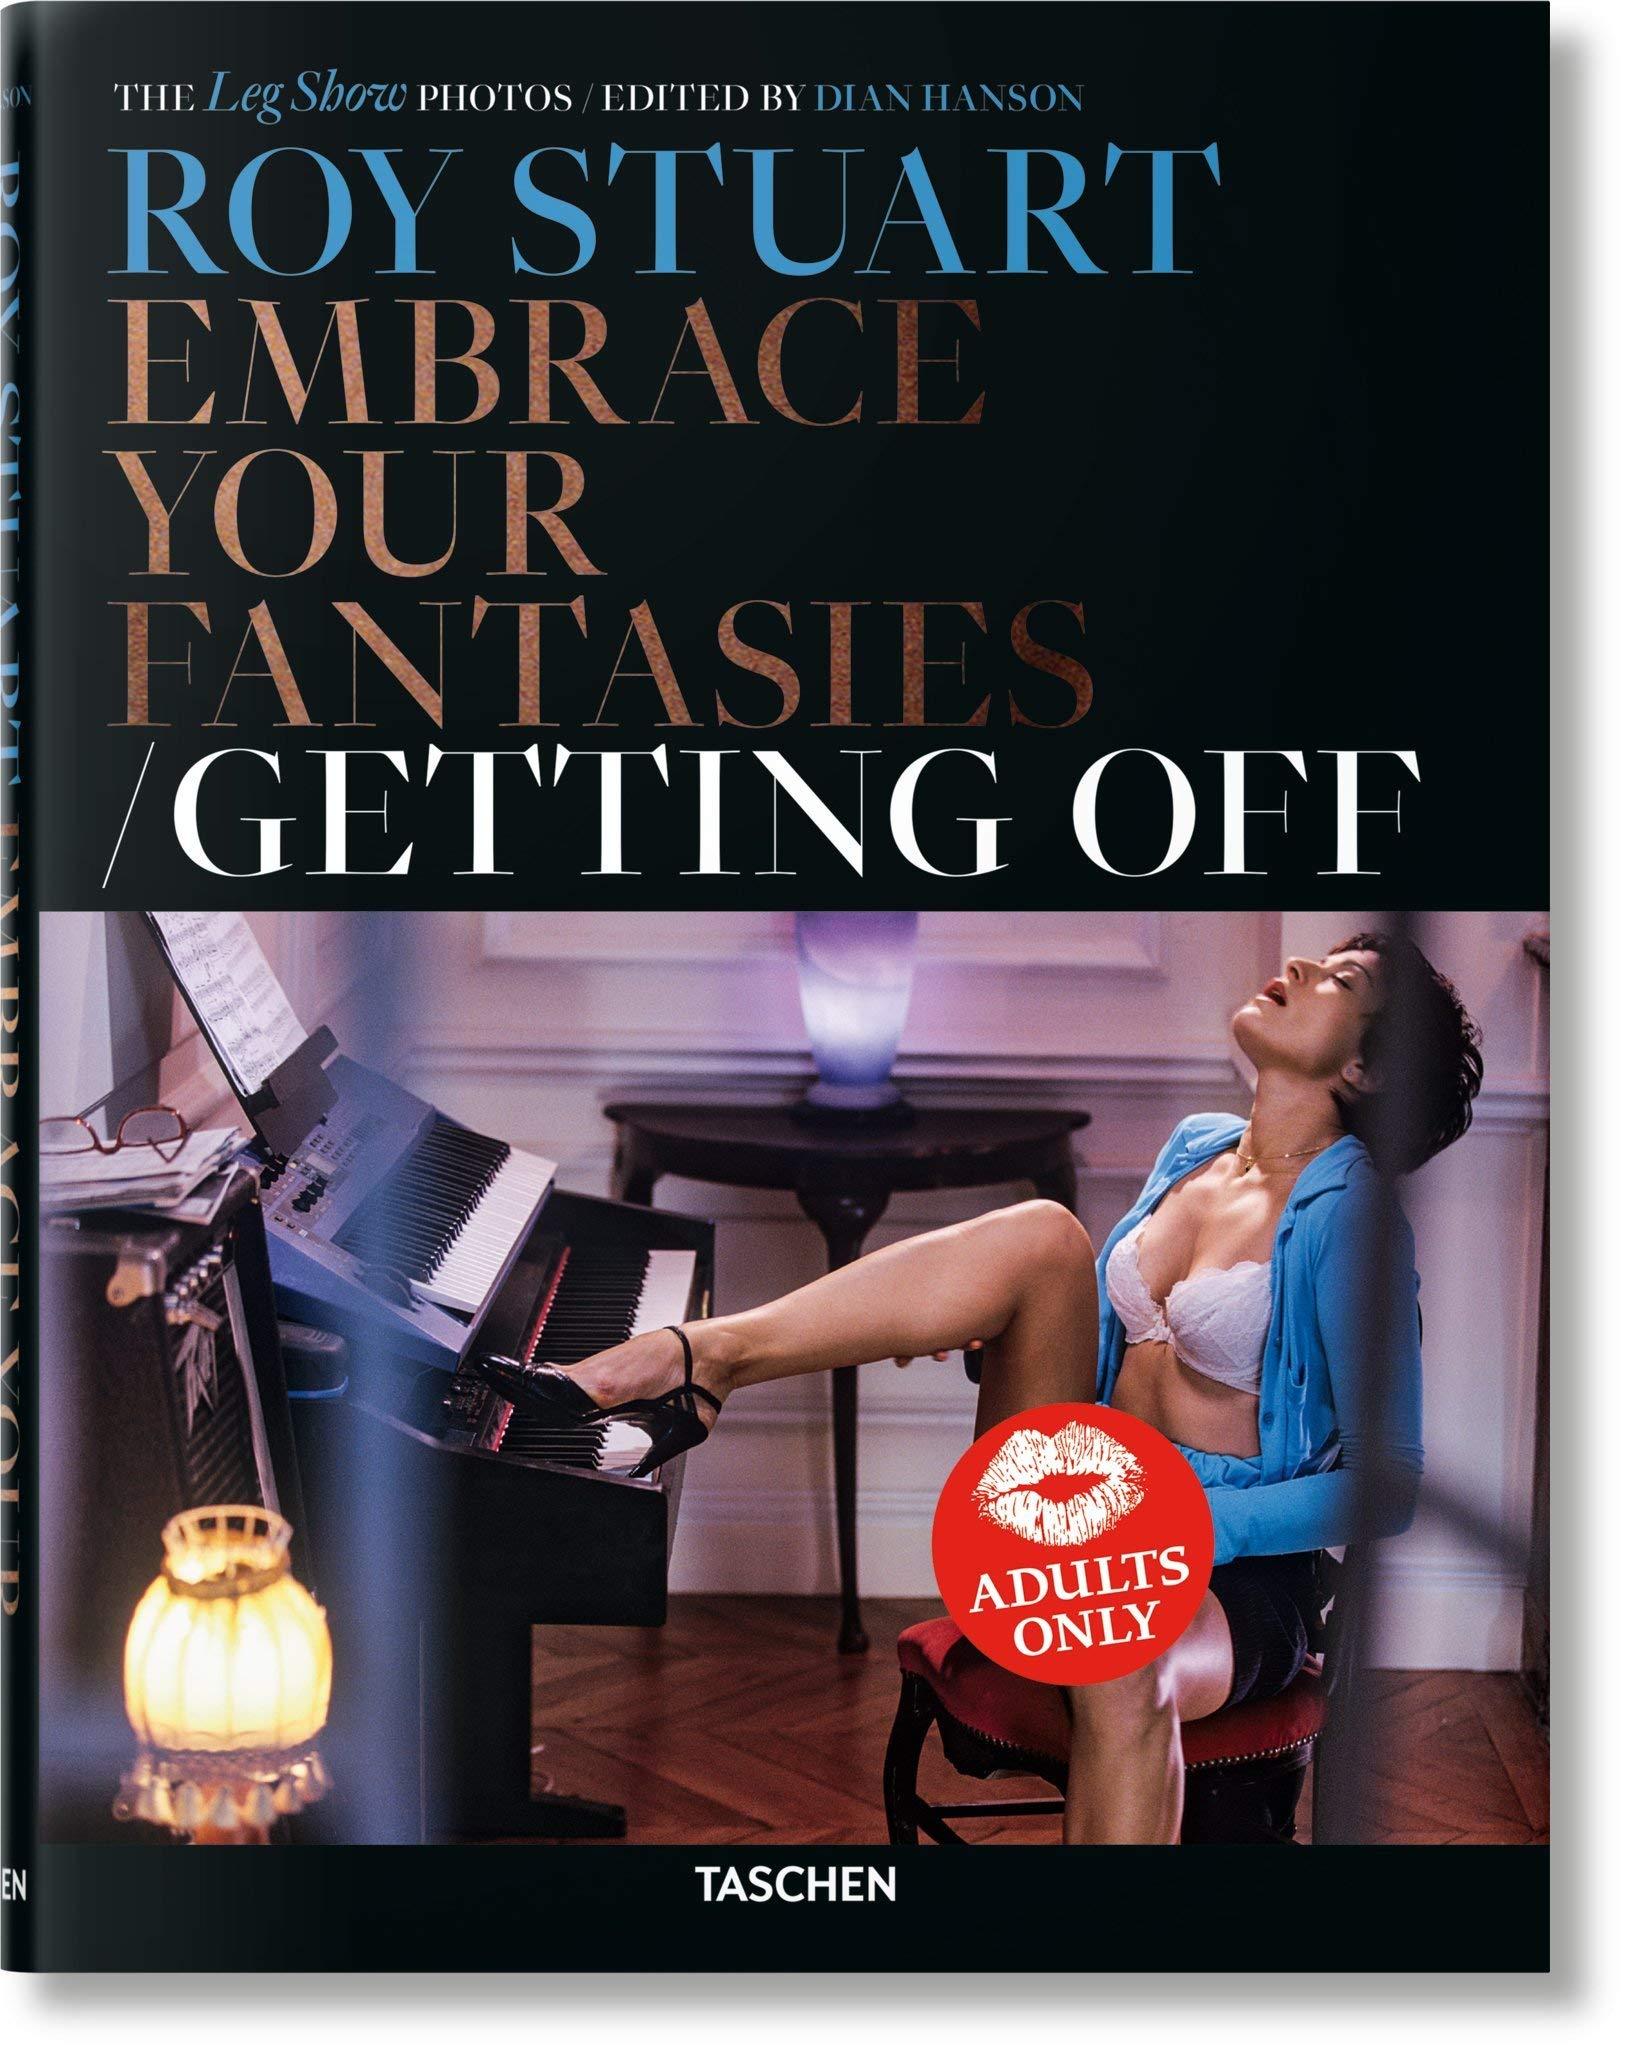 Roy Stuart. The Leg Show Photos: Embrace Your Fantasies, Getting Off (alemán, francés, inglés) (Fotografia)